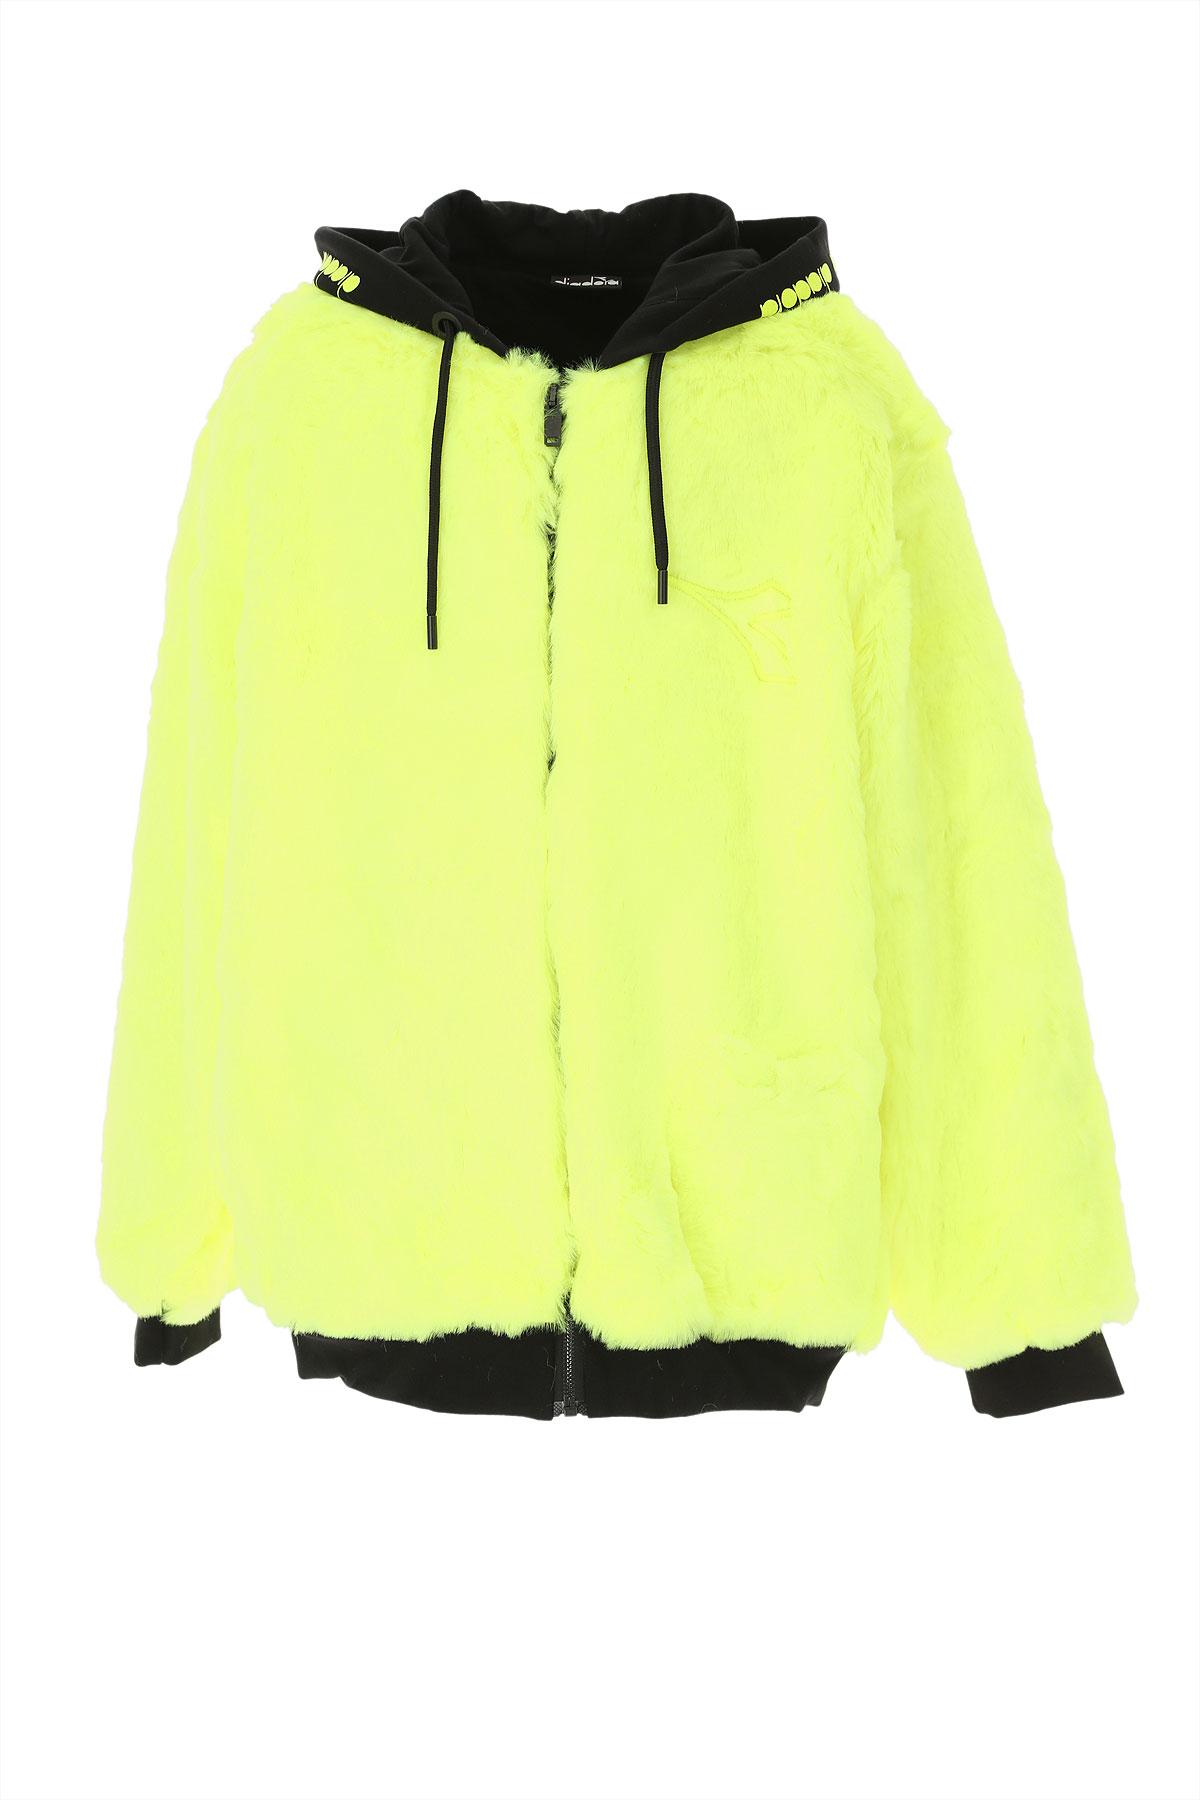 Diadora Kids Sweatshirts & Hoodies for Girls On Sale, Black, polyester, 2019, 10Y 12Y 14Y